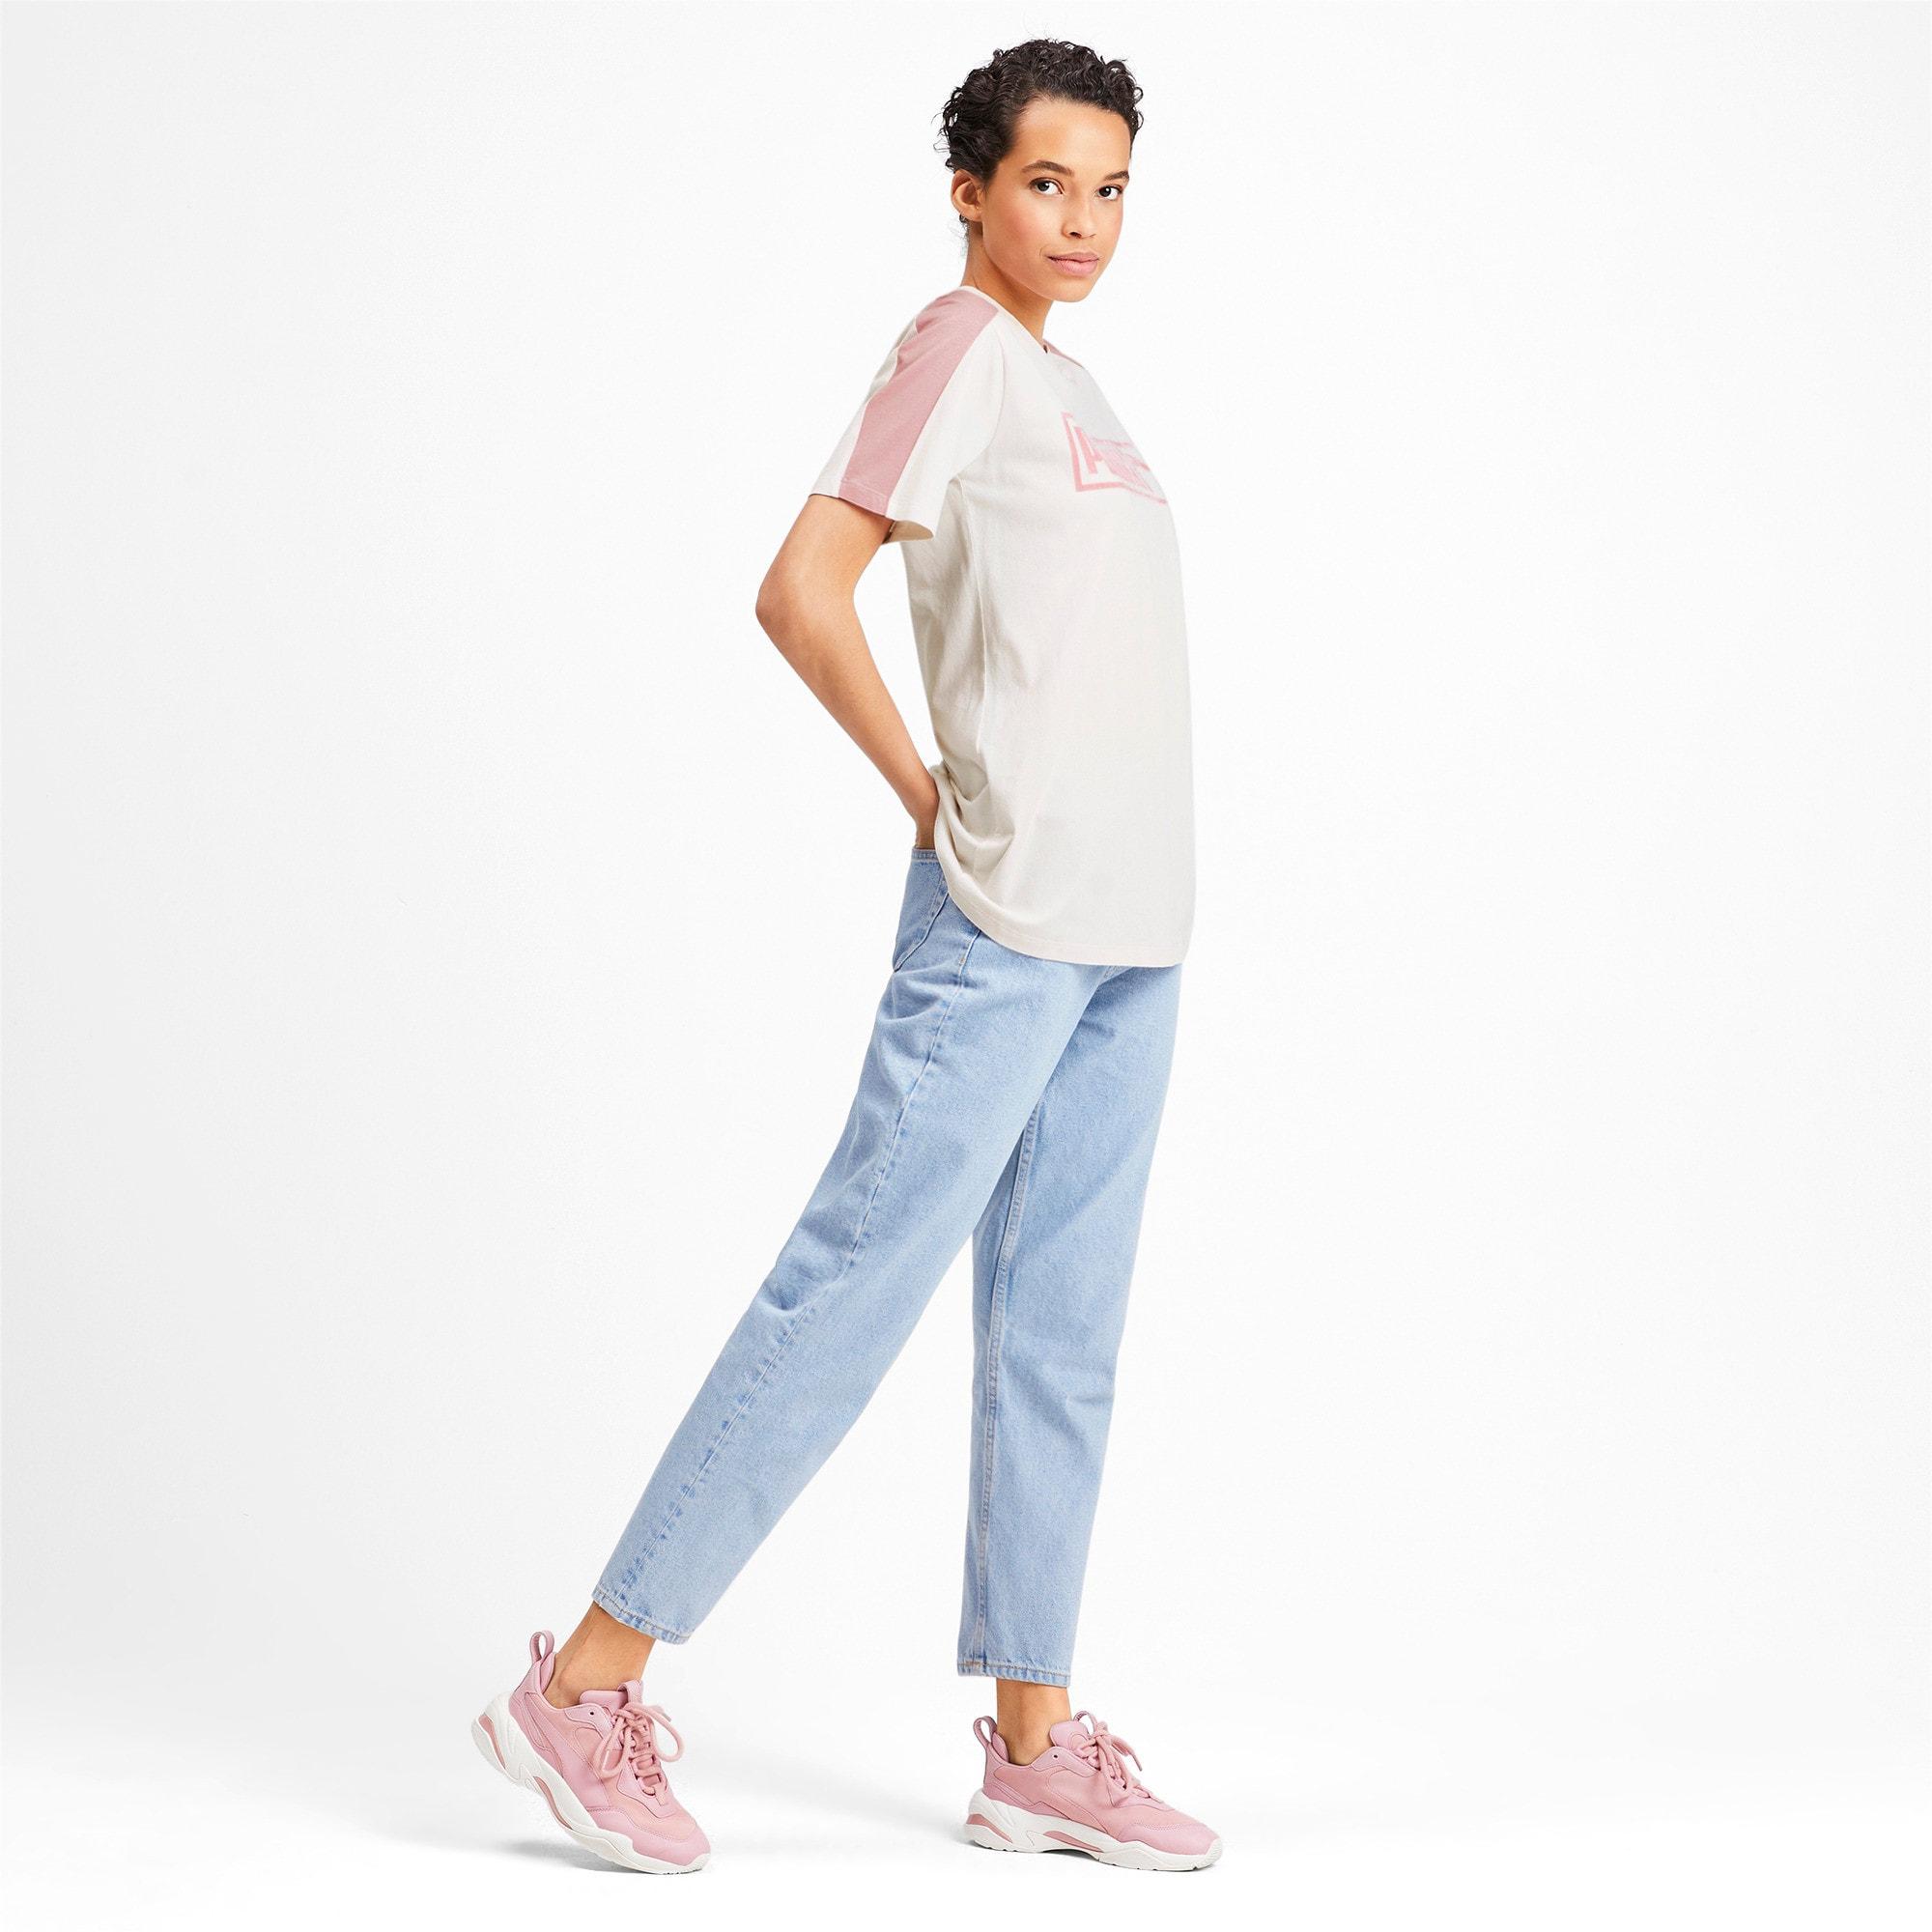 Miniatura 4 de Camiseta Classics No.2 T7 para mujer, Pastel Parchment, mediano